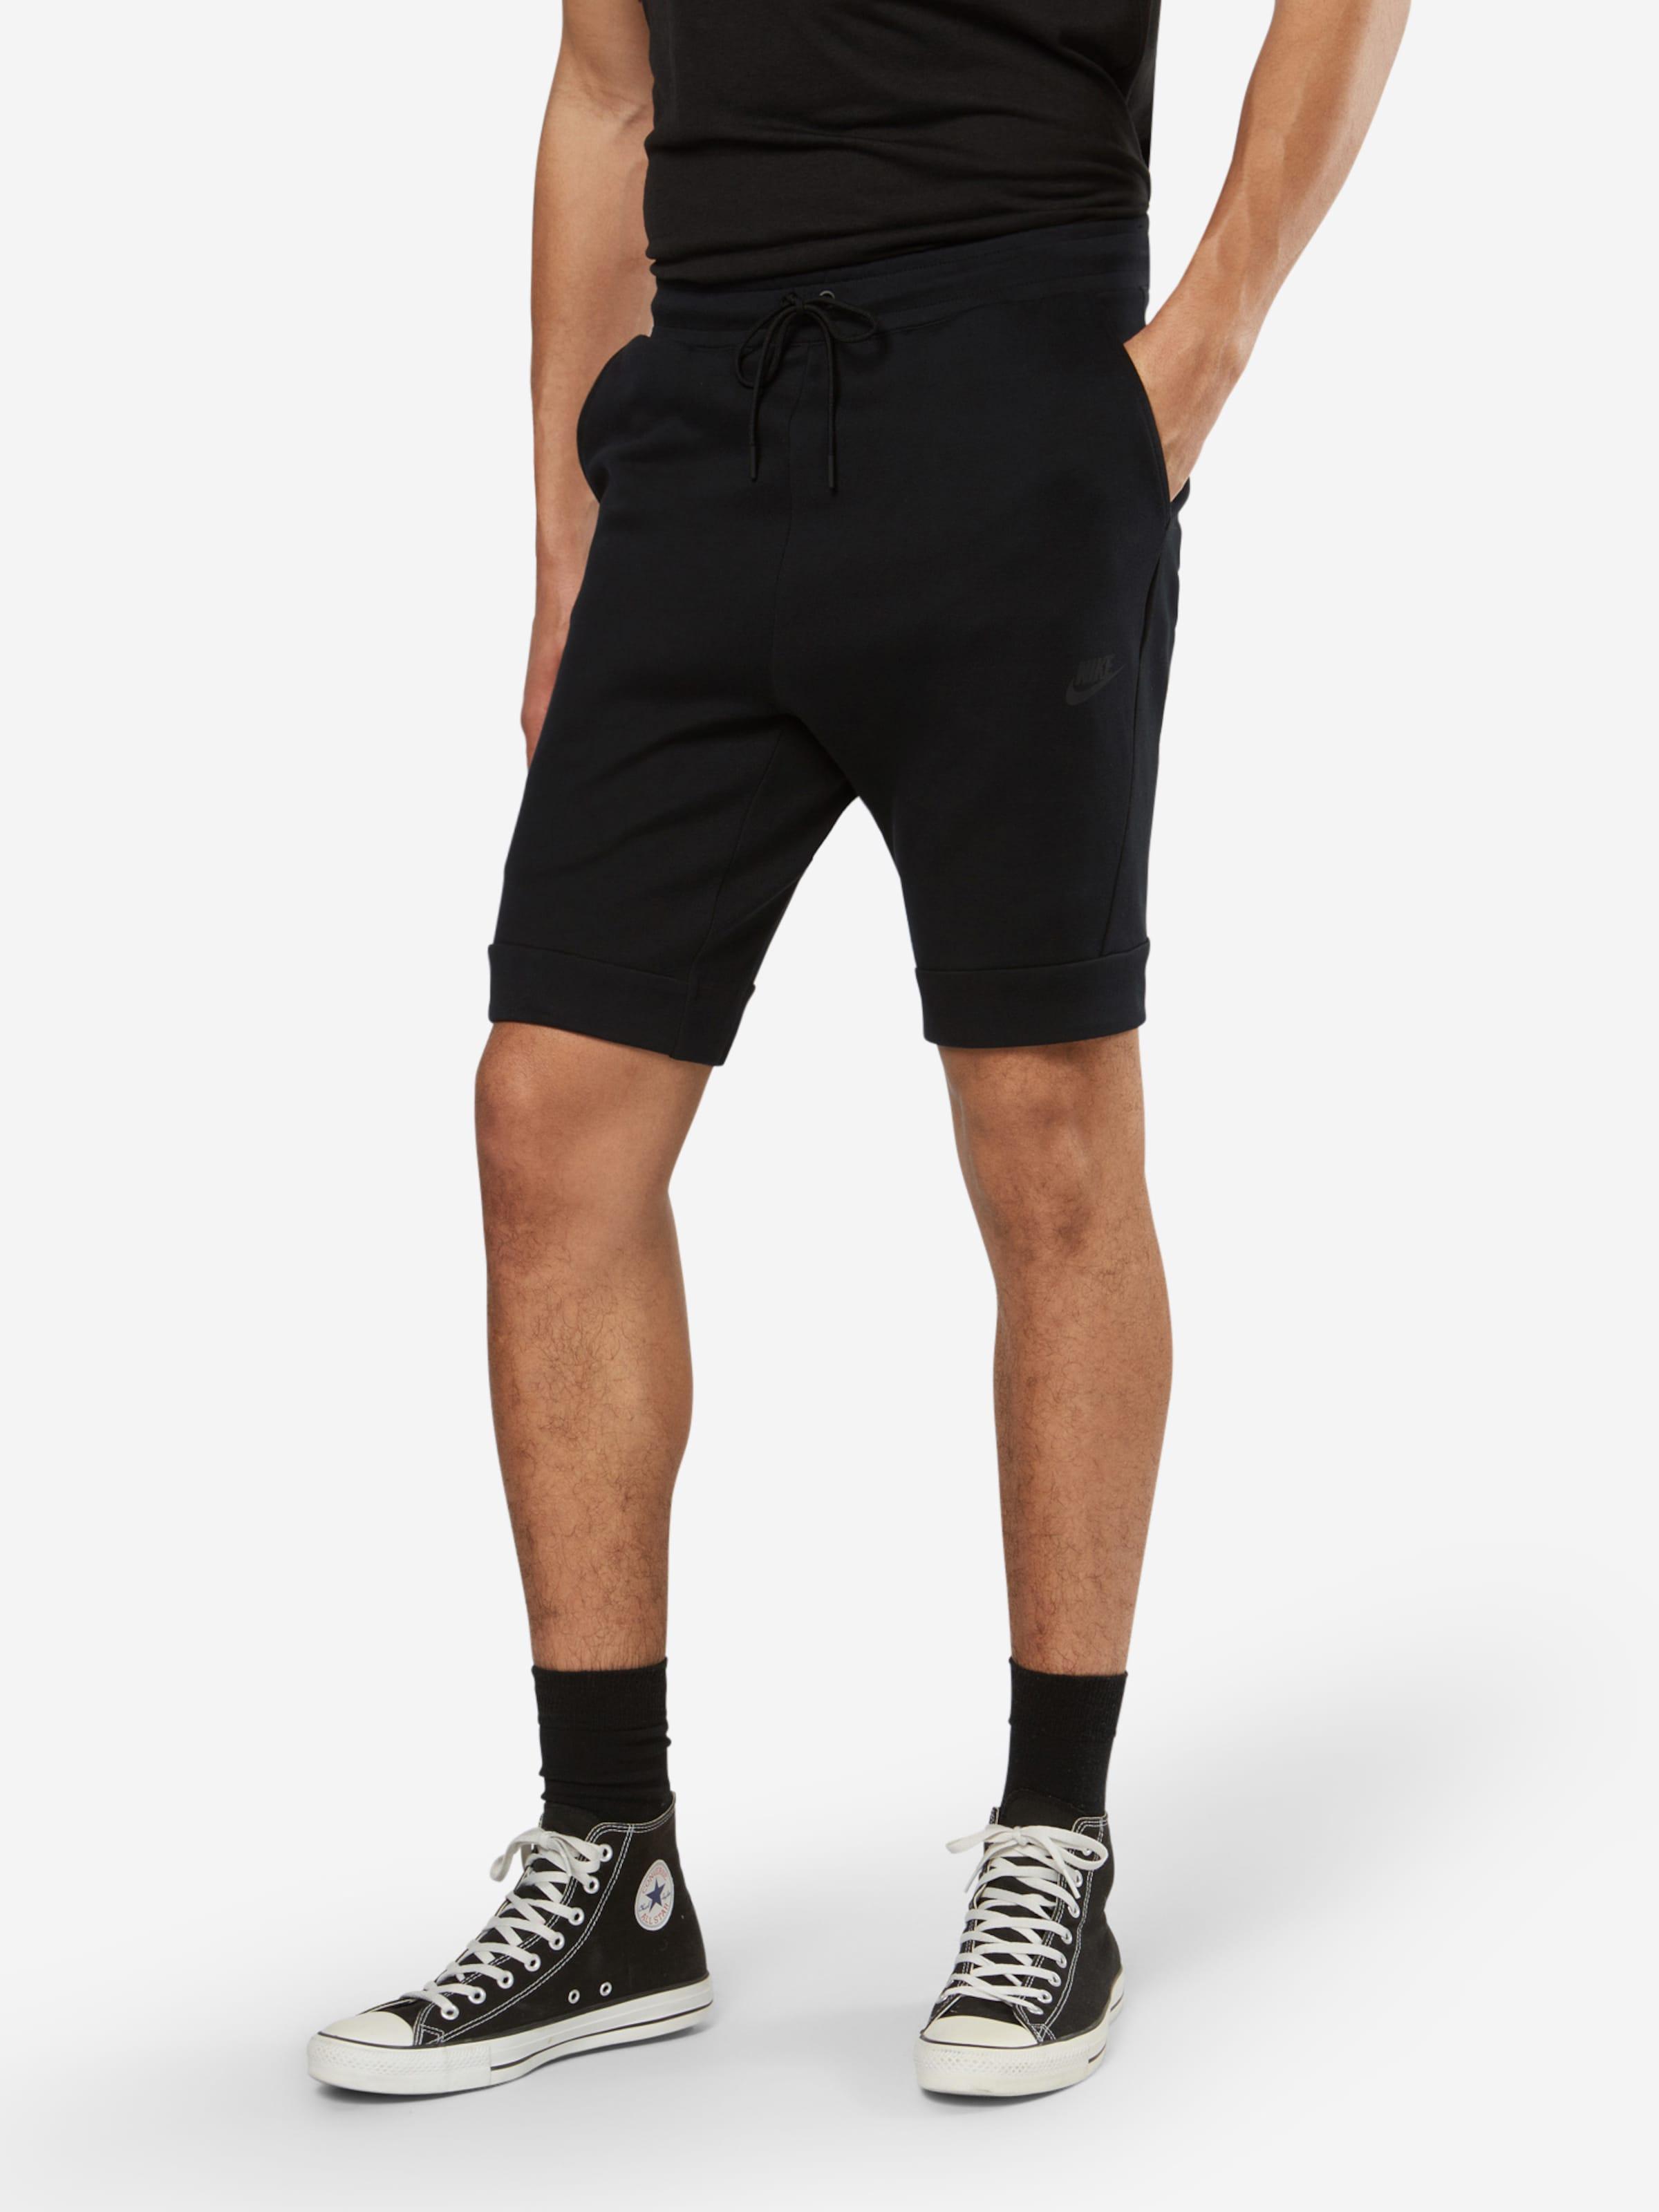 Rabatt-Ansicht Steckdose Niedrigsten Preis Nike Sportswear Short mit Tunnelzug 'Men's Nike Sportswear Tech Fleece' Freies Verschiffen 2018 Neue FT79s